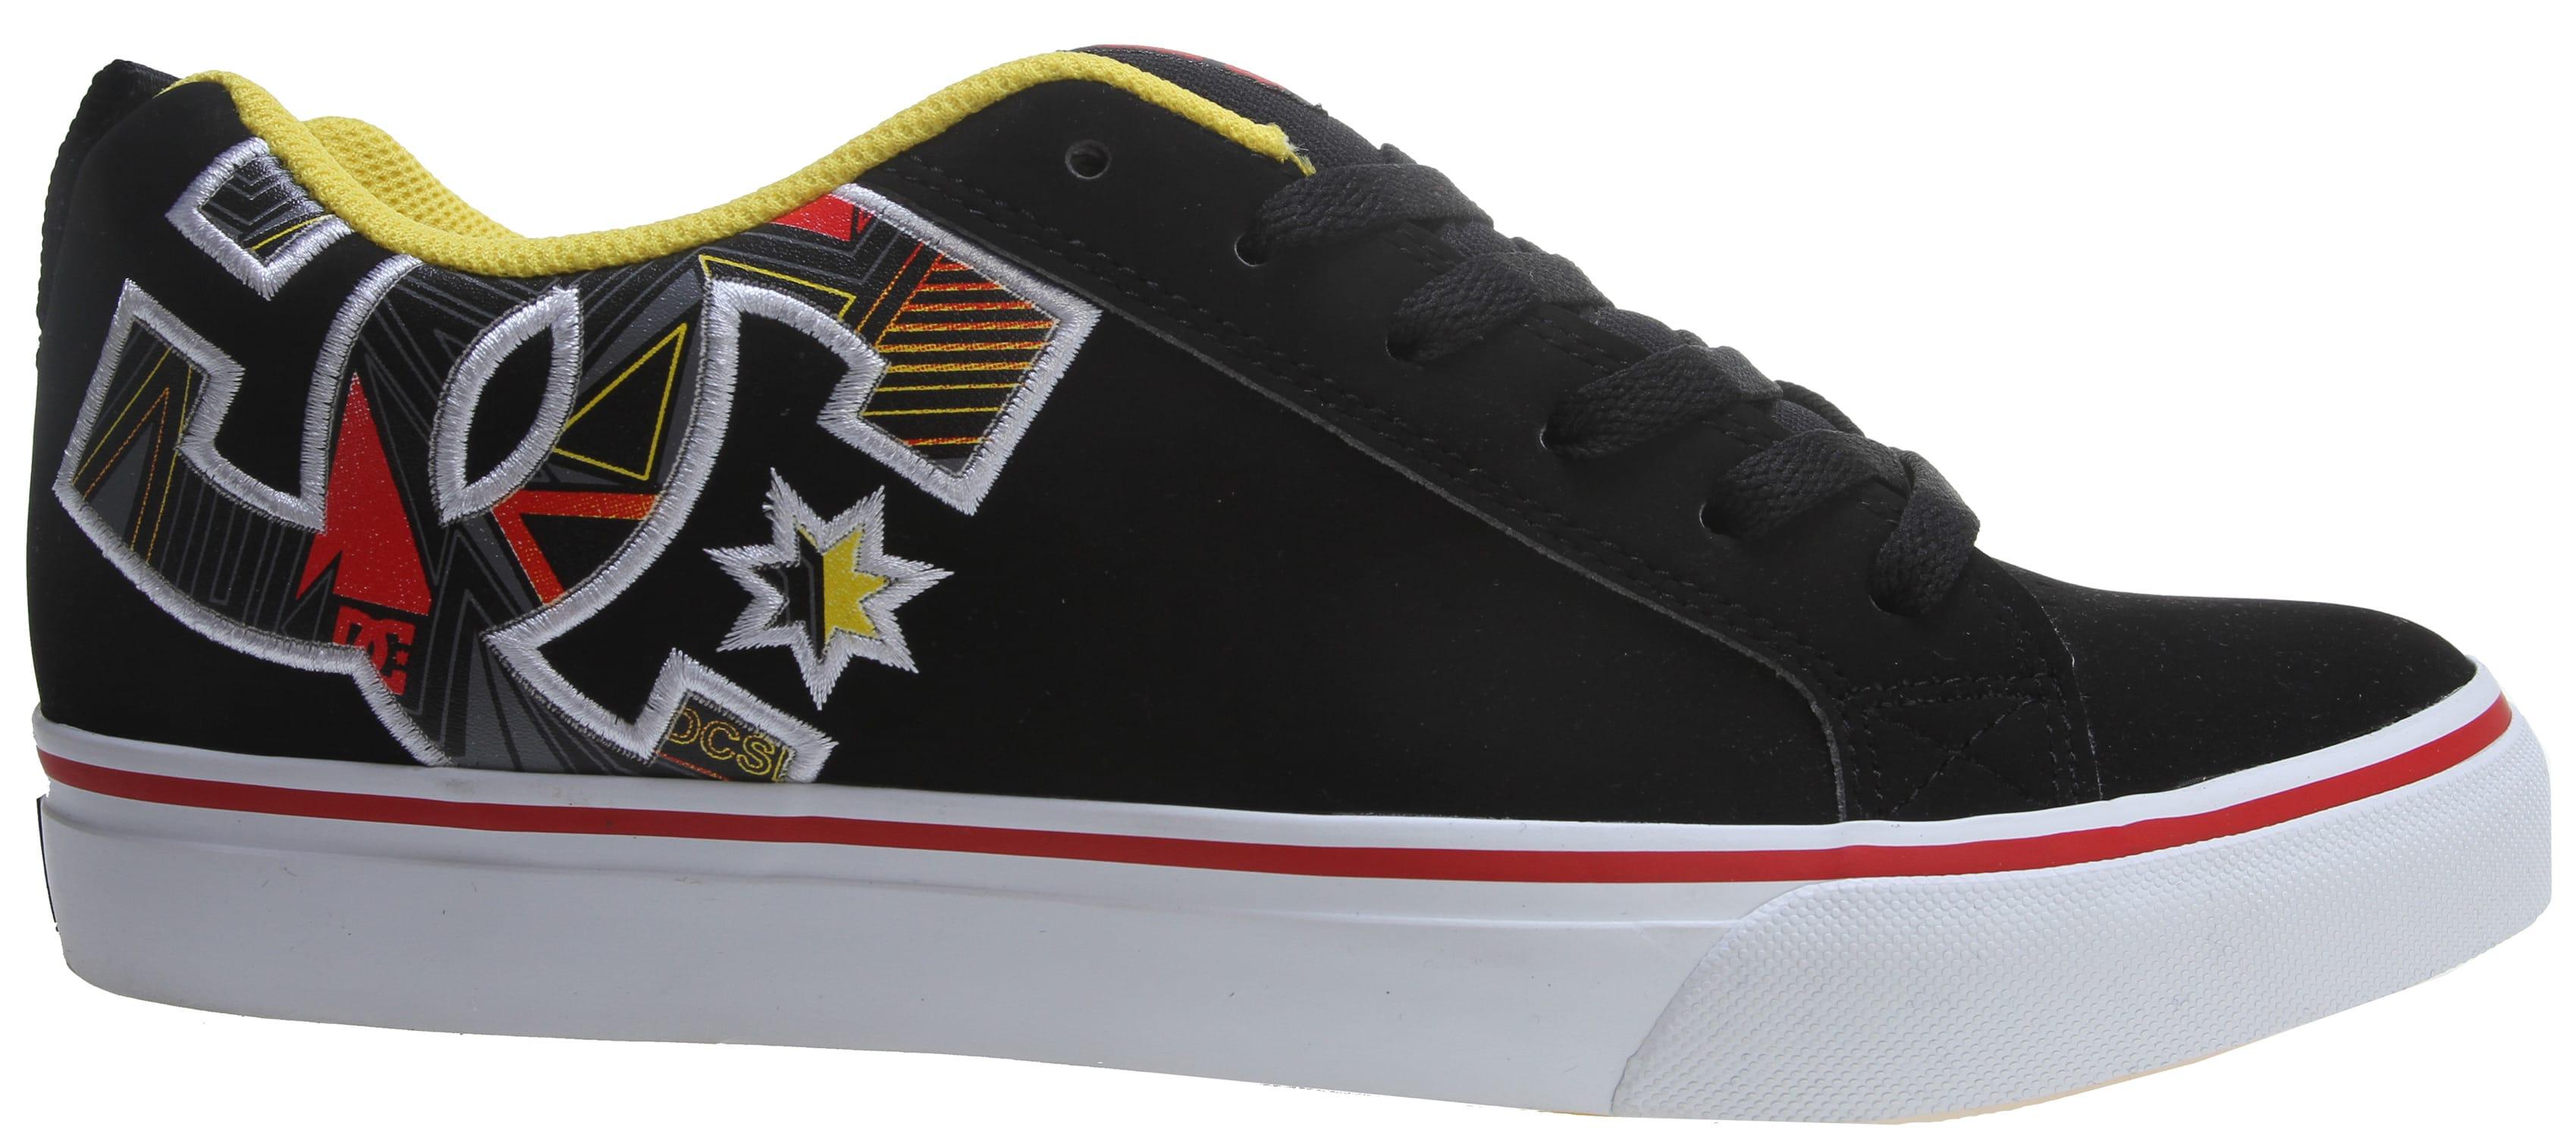 Dc Womens Graffiti Skate Shoes